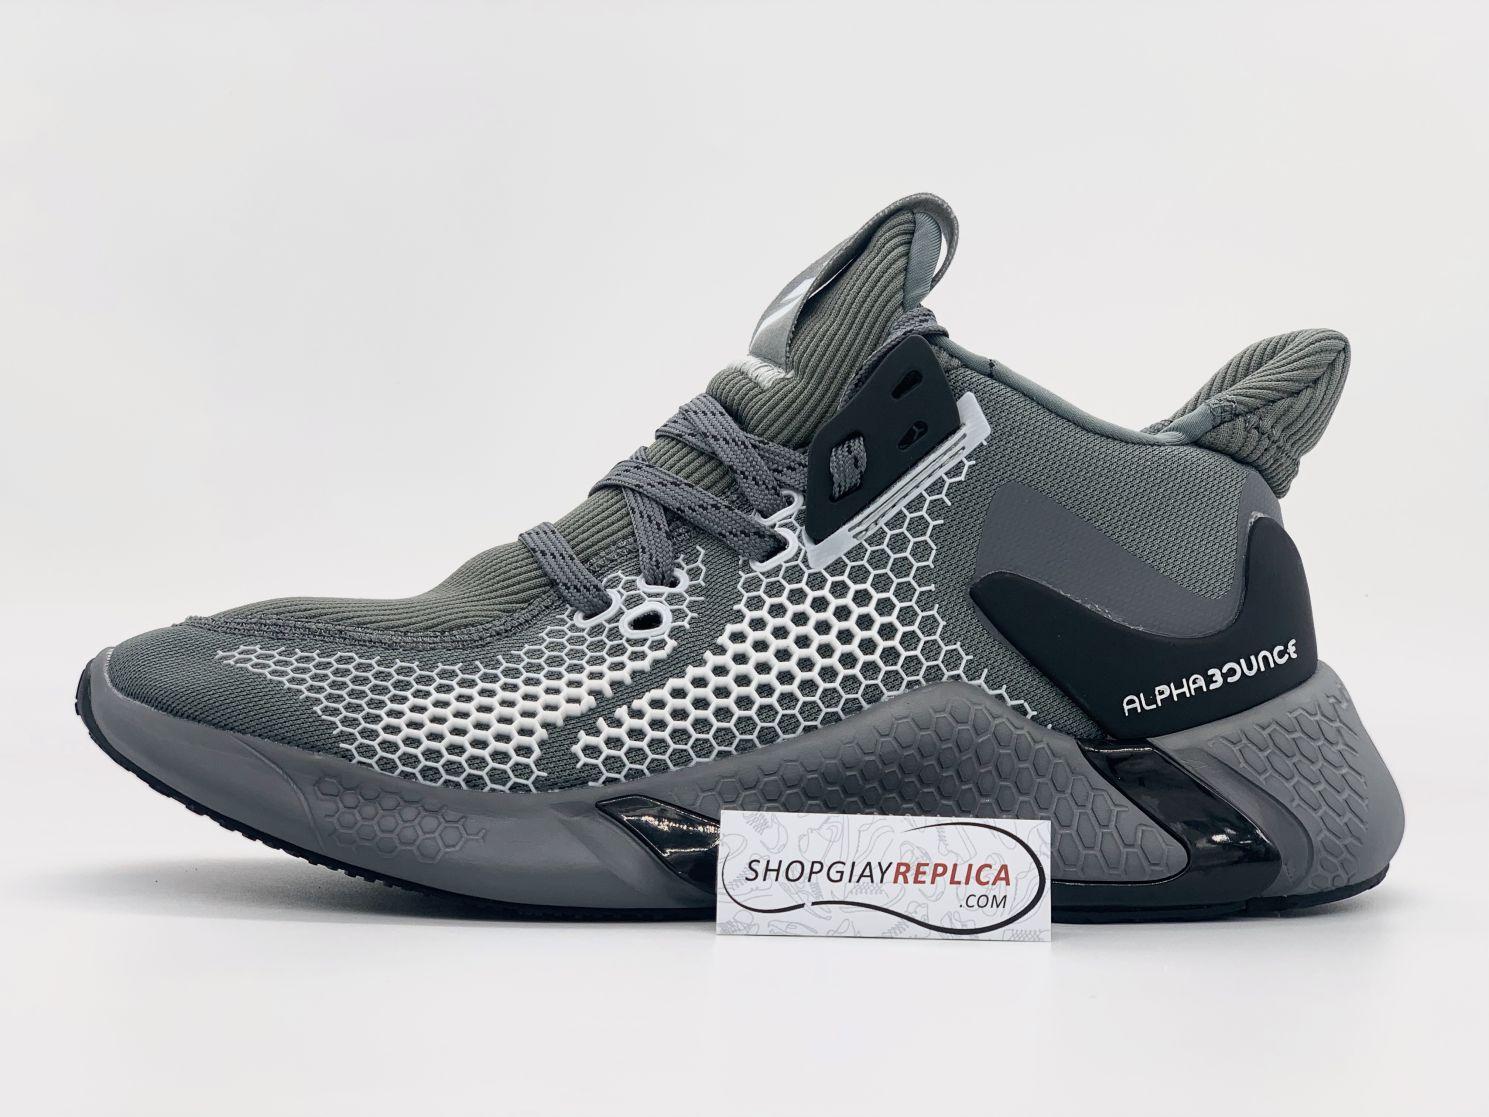 Giày Adidas Alphabounce Instinct M xám bạc Rep 1:1